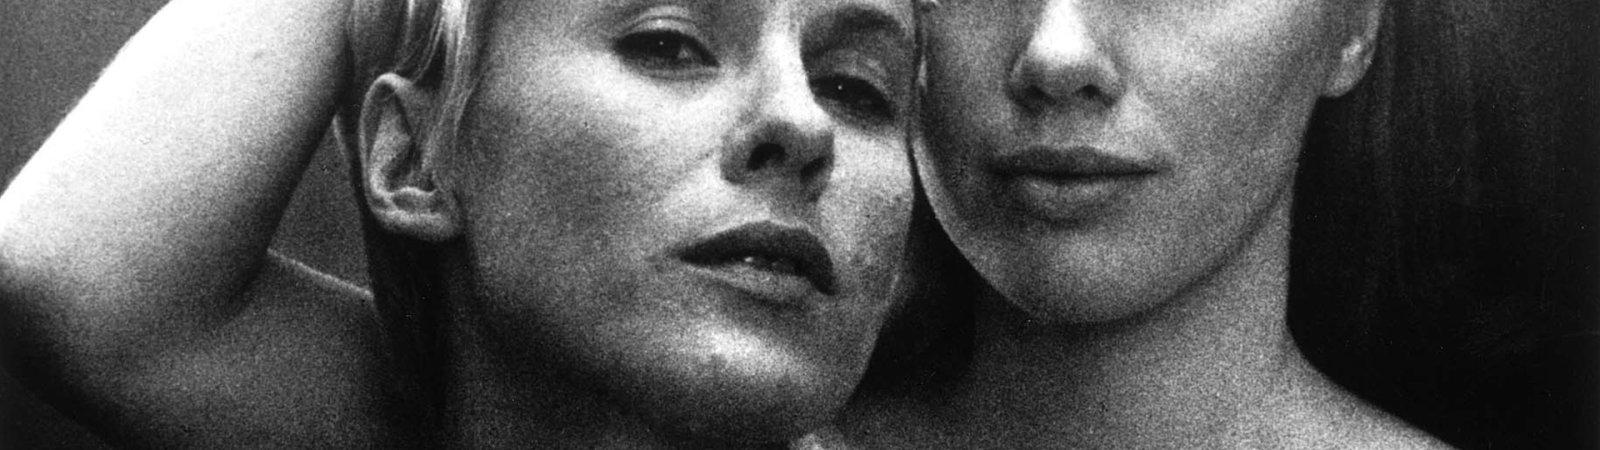 Photo dernier film Gunnar Bjornstrand